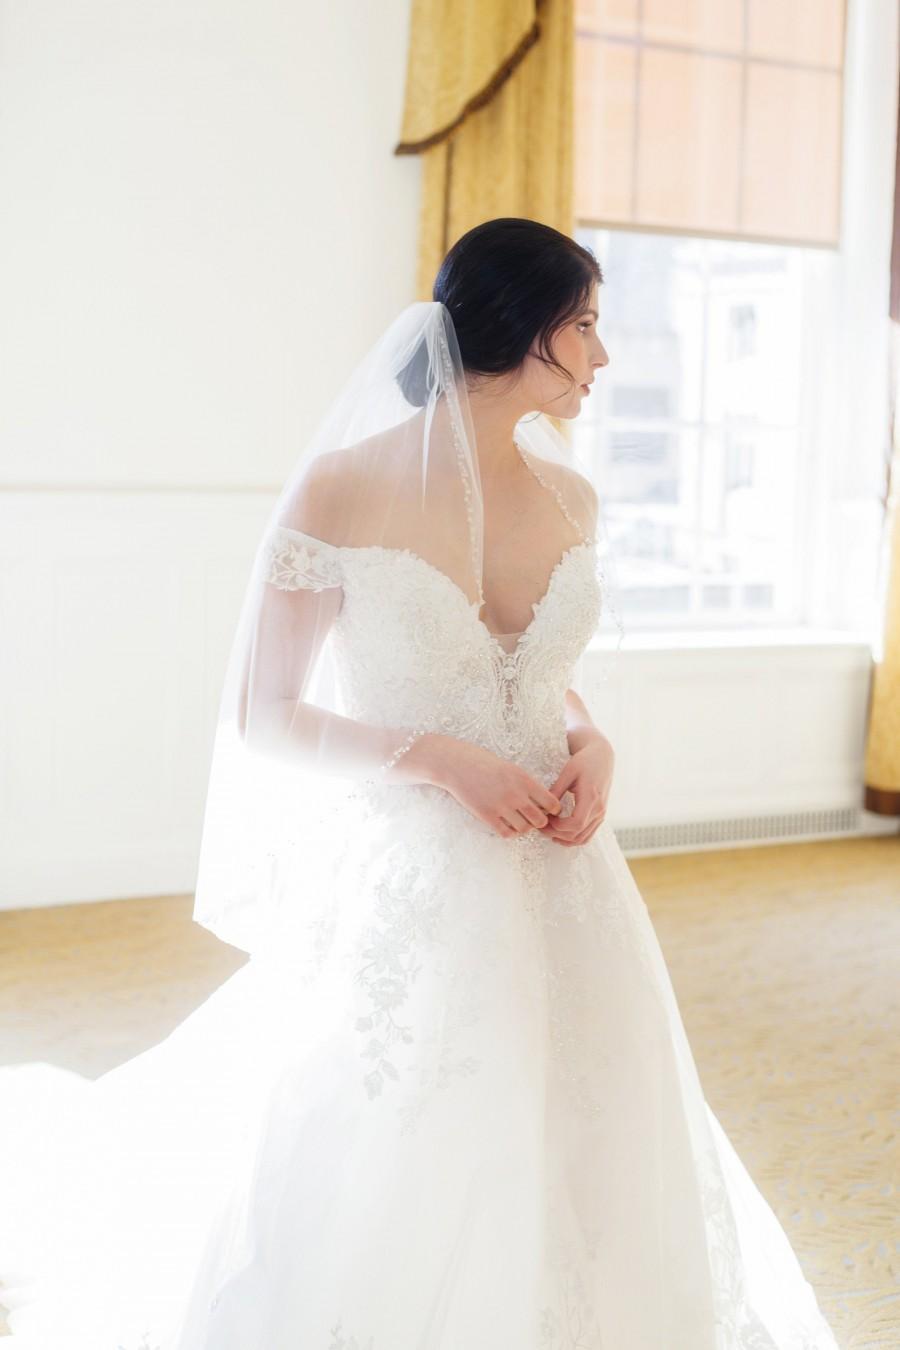 Hochzeit - 1 Tier Beaded Wedding Veil, Crystal Beaded Edge, Crystal Sheer Bridal Veil, Single Tier Veil, Ivory Wedding Veil